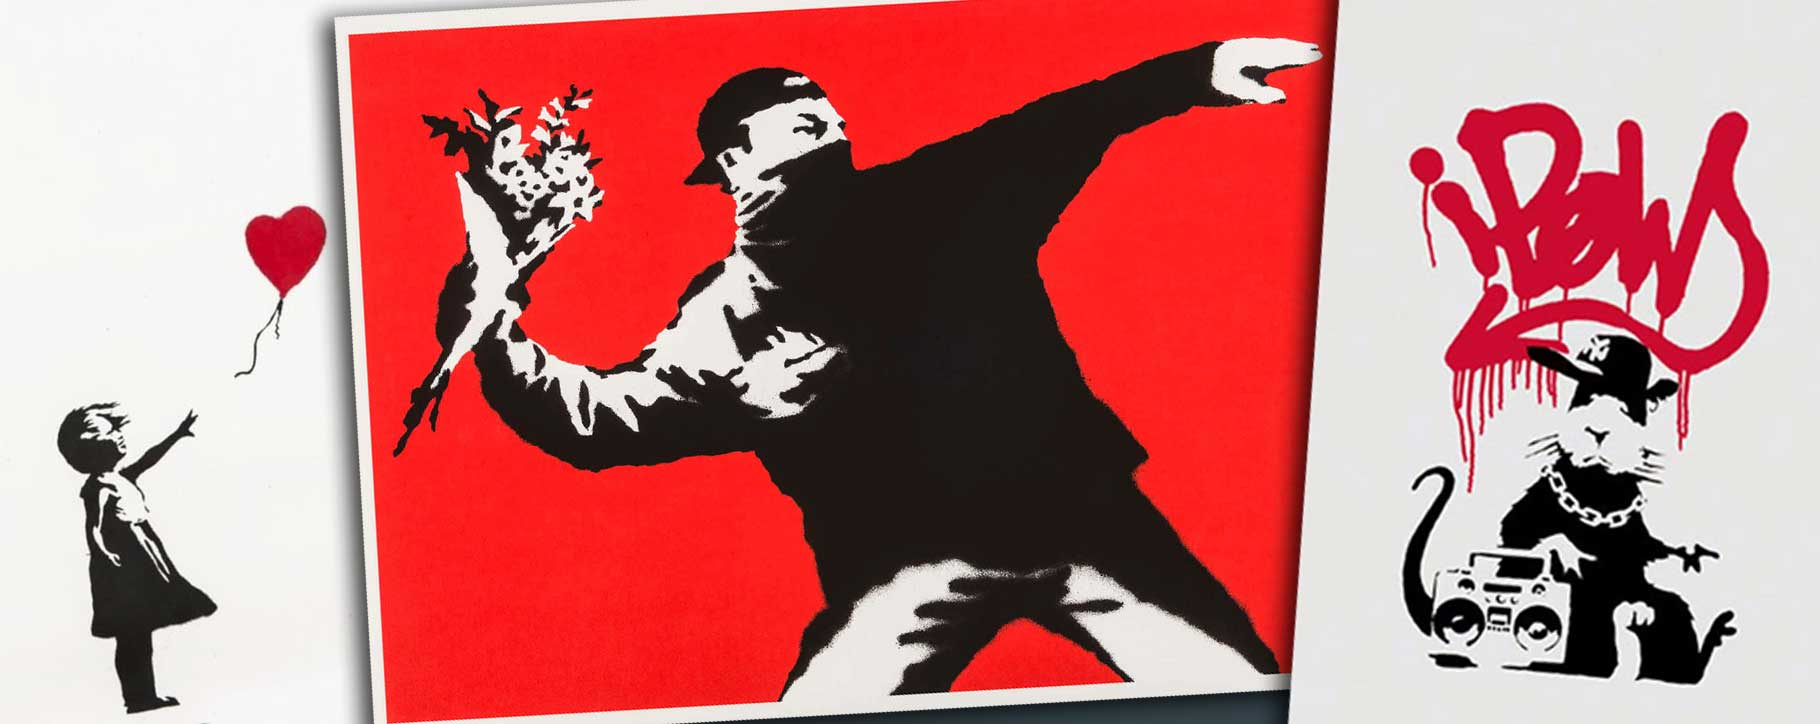 Banksy restorations on paper